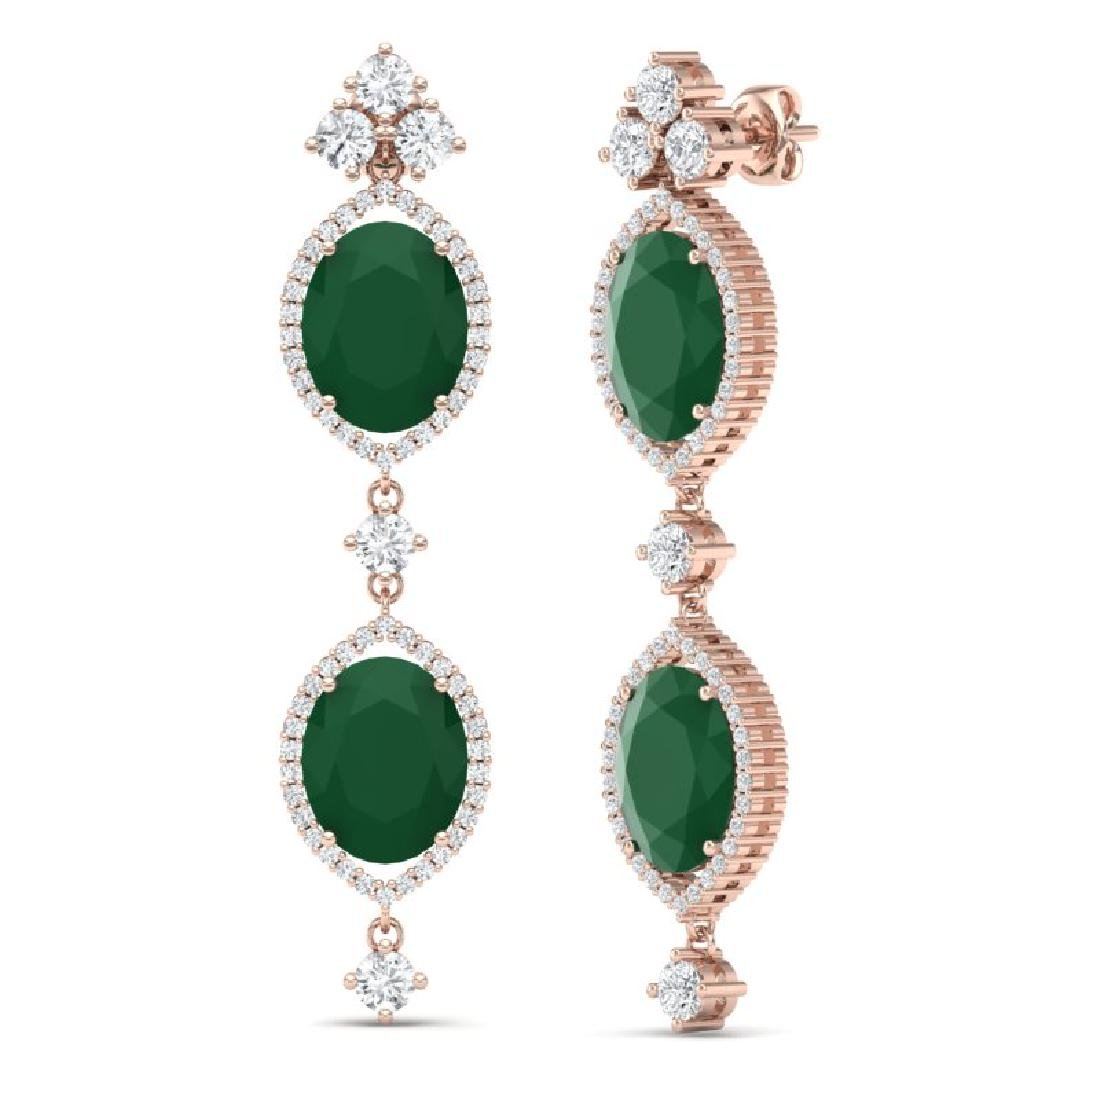 15.81 CTW Royalty Emerald & VS Diamond Earrings 18K - 3